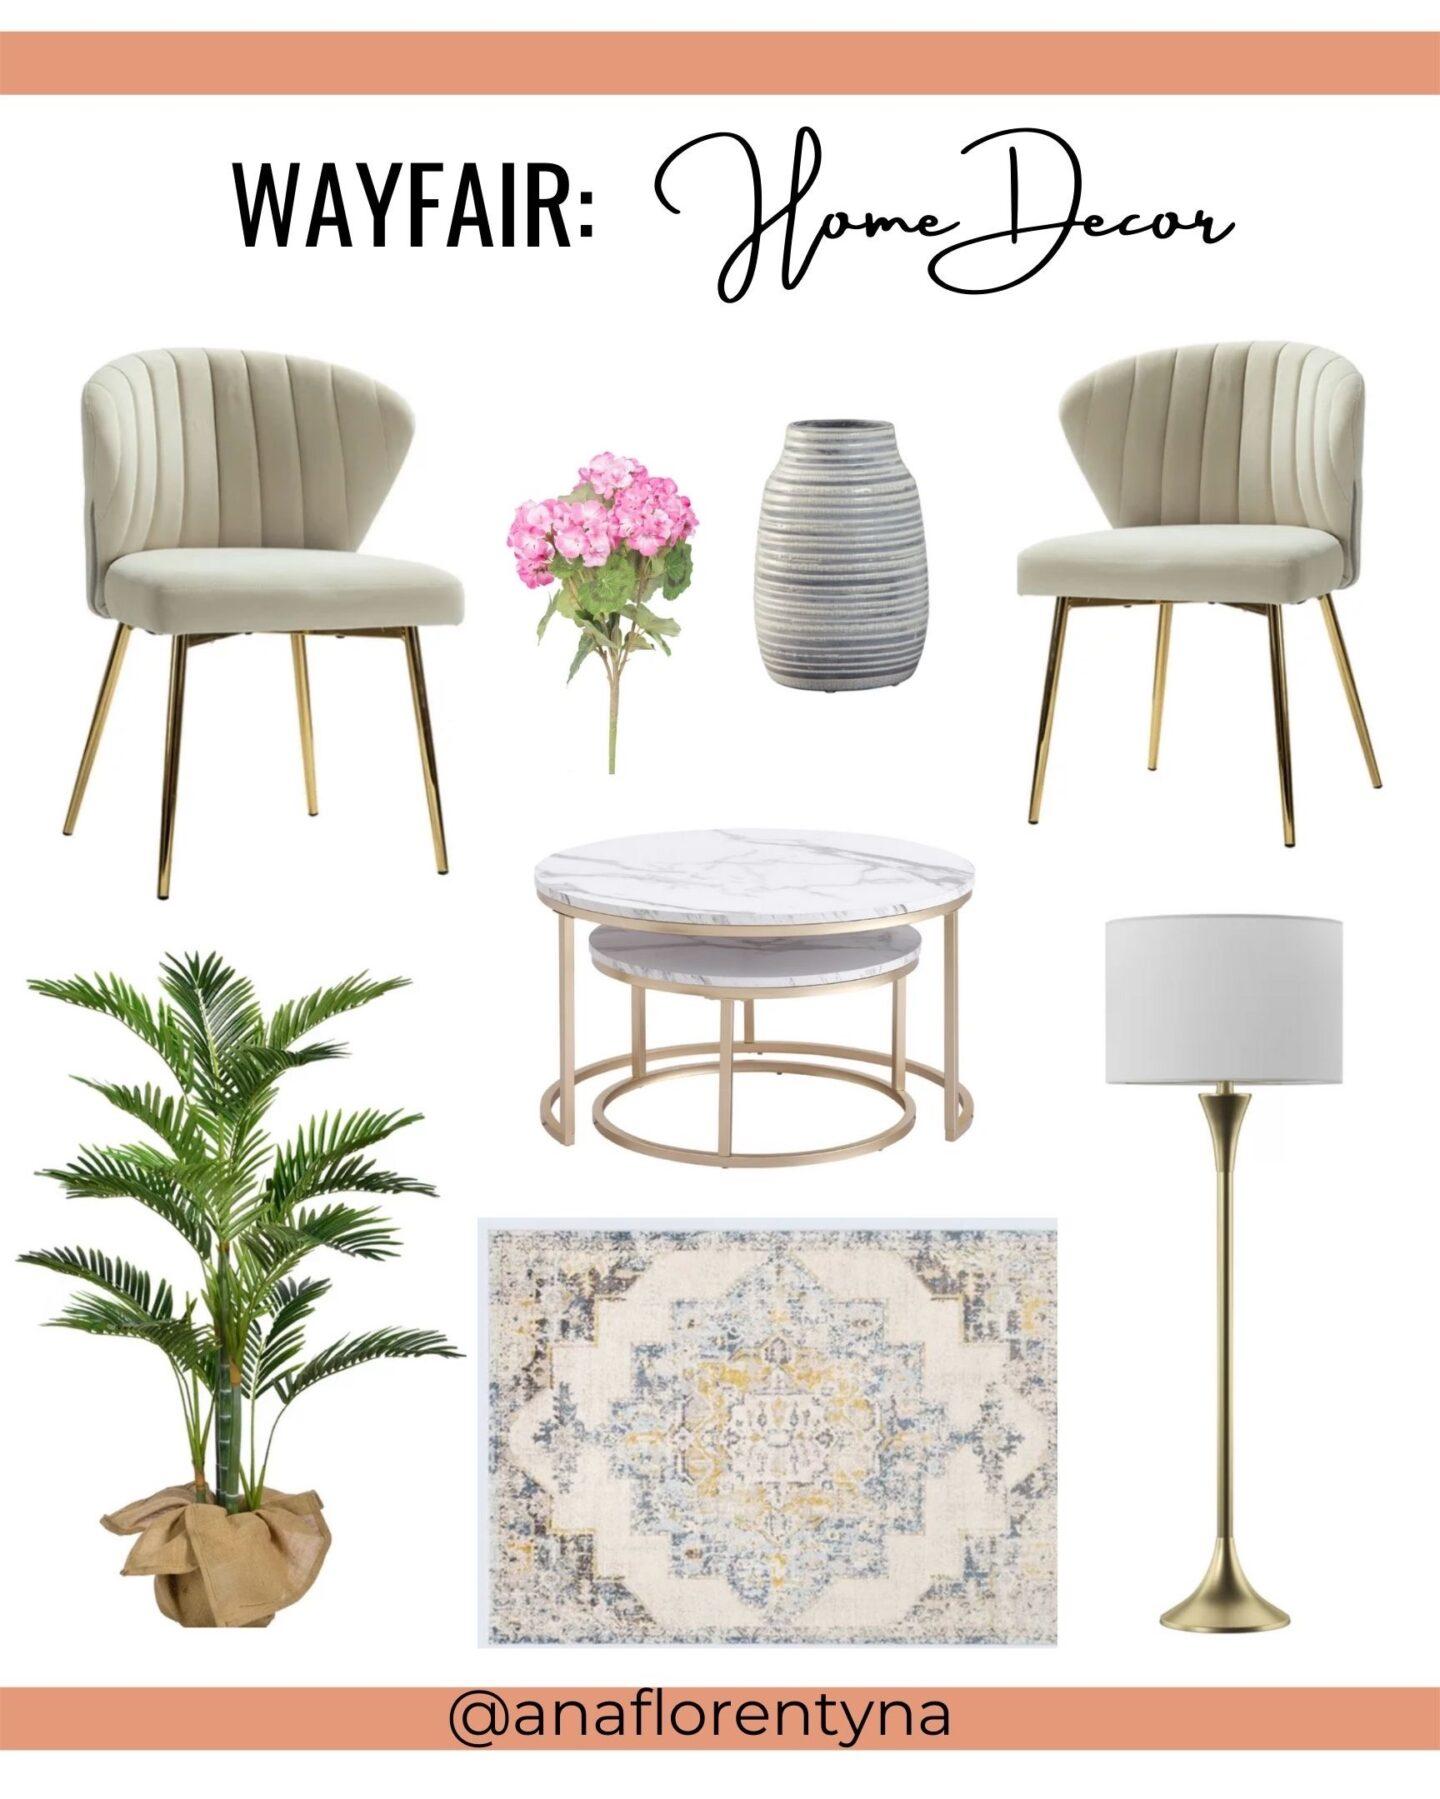 wayfair sale ends tonight